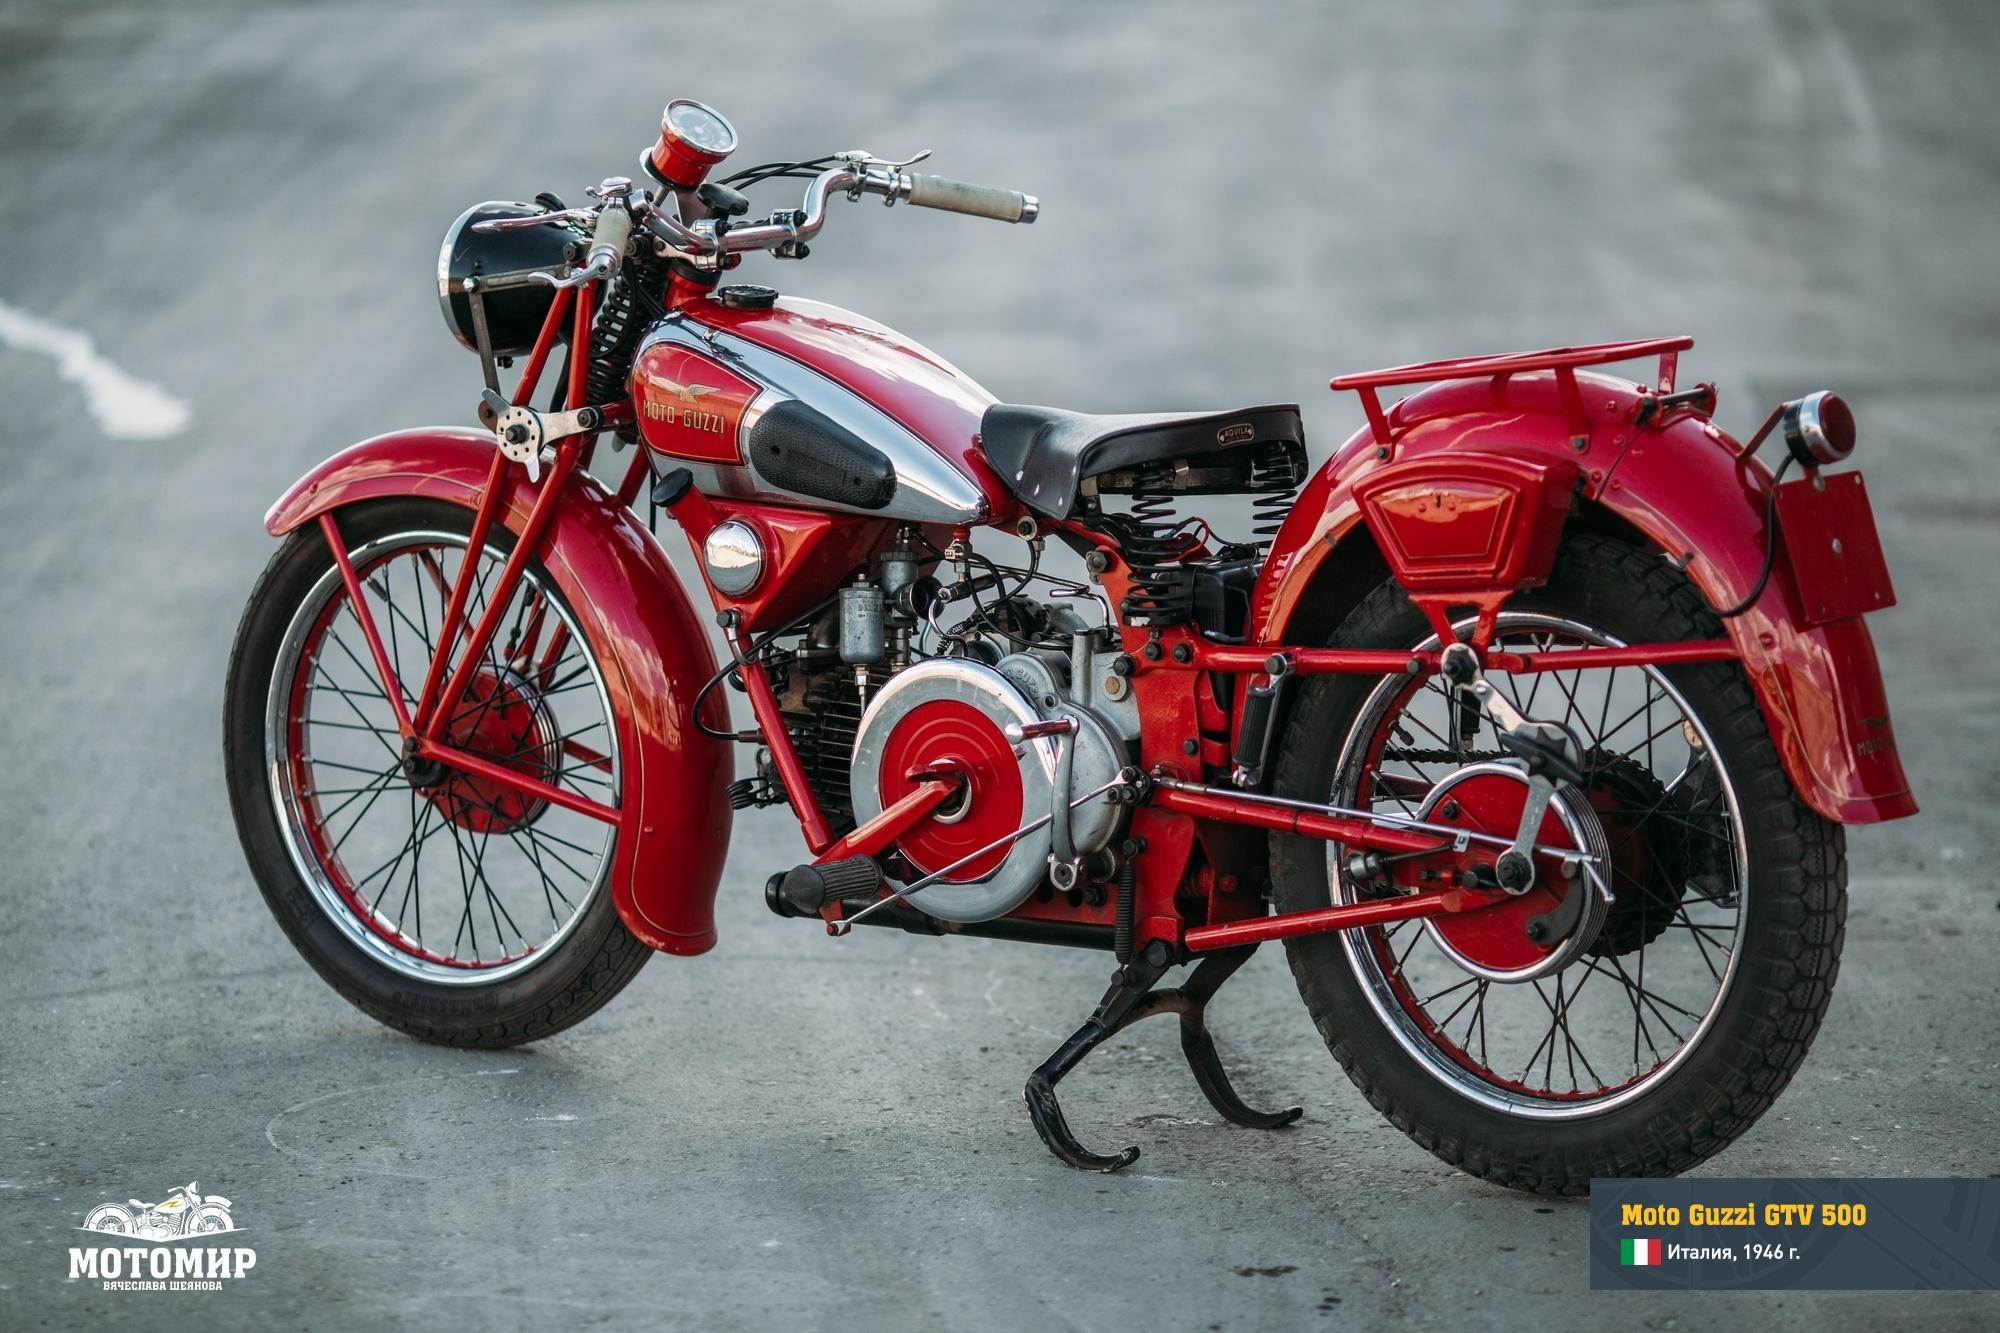 moto-guzzi-gtv-500-201509-web-04